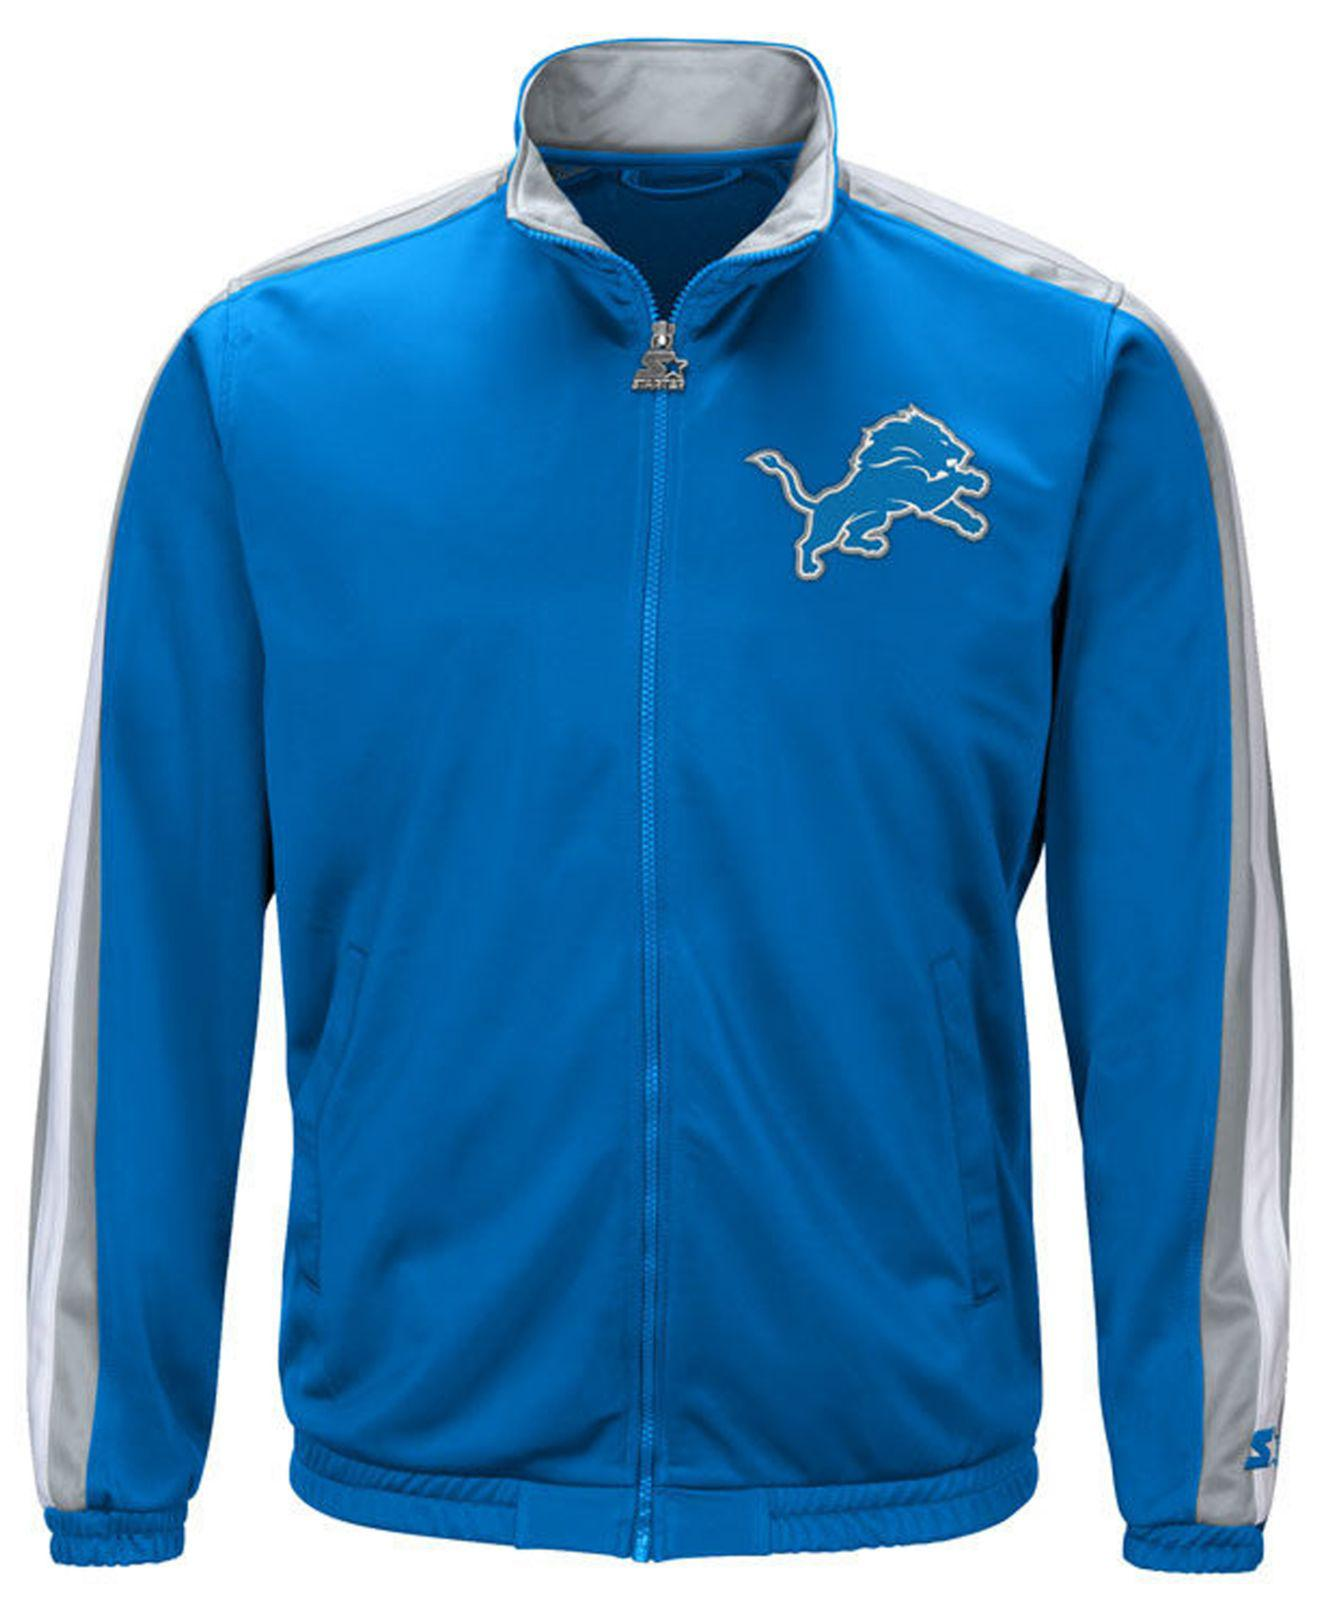 Lyst - Starter Detroit Lions The Challenger Track Jacket in Blue for Men 90222e4f2